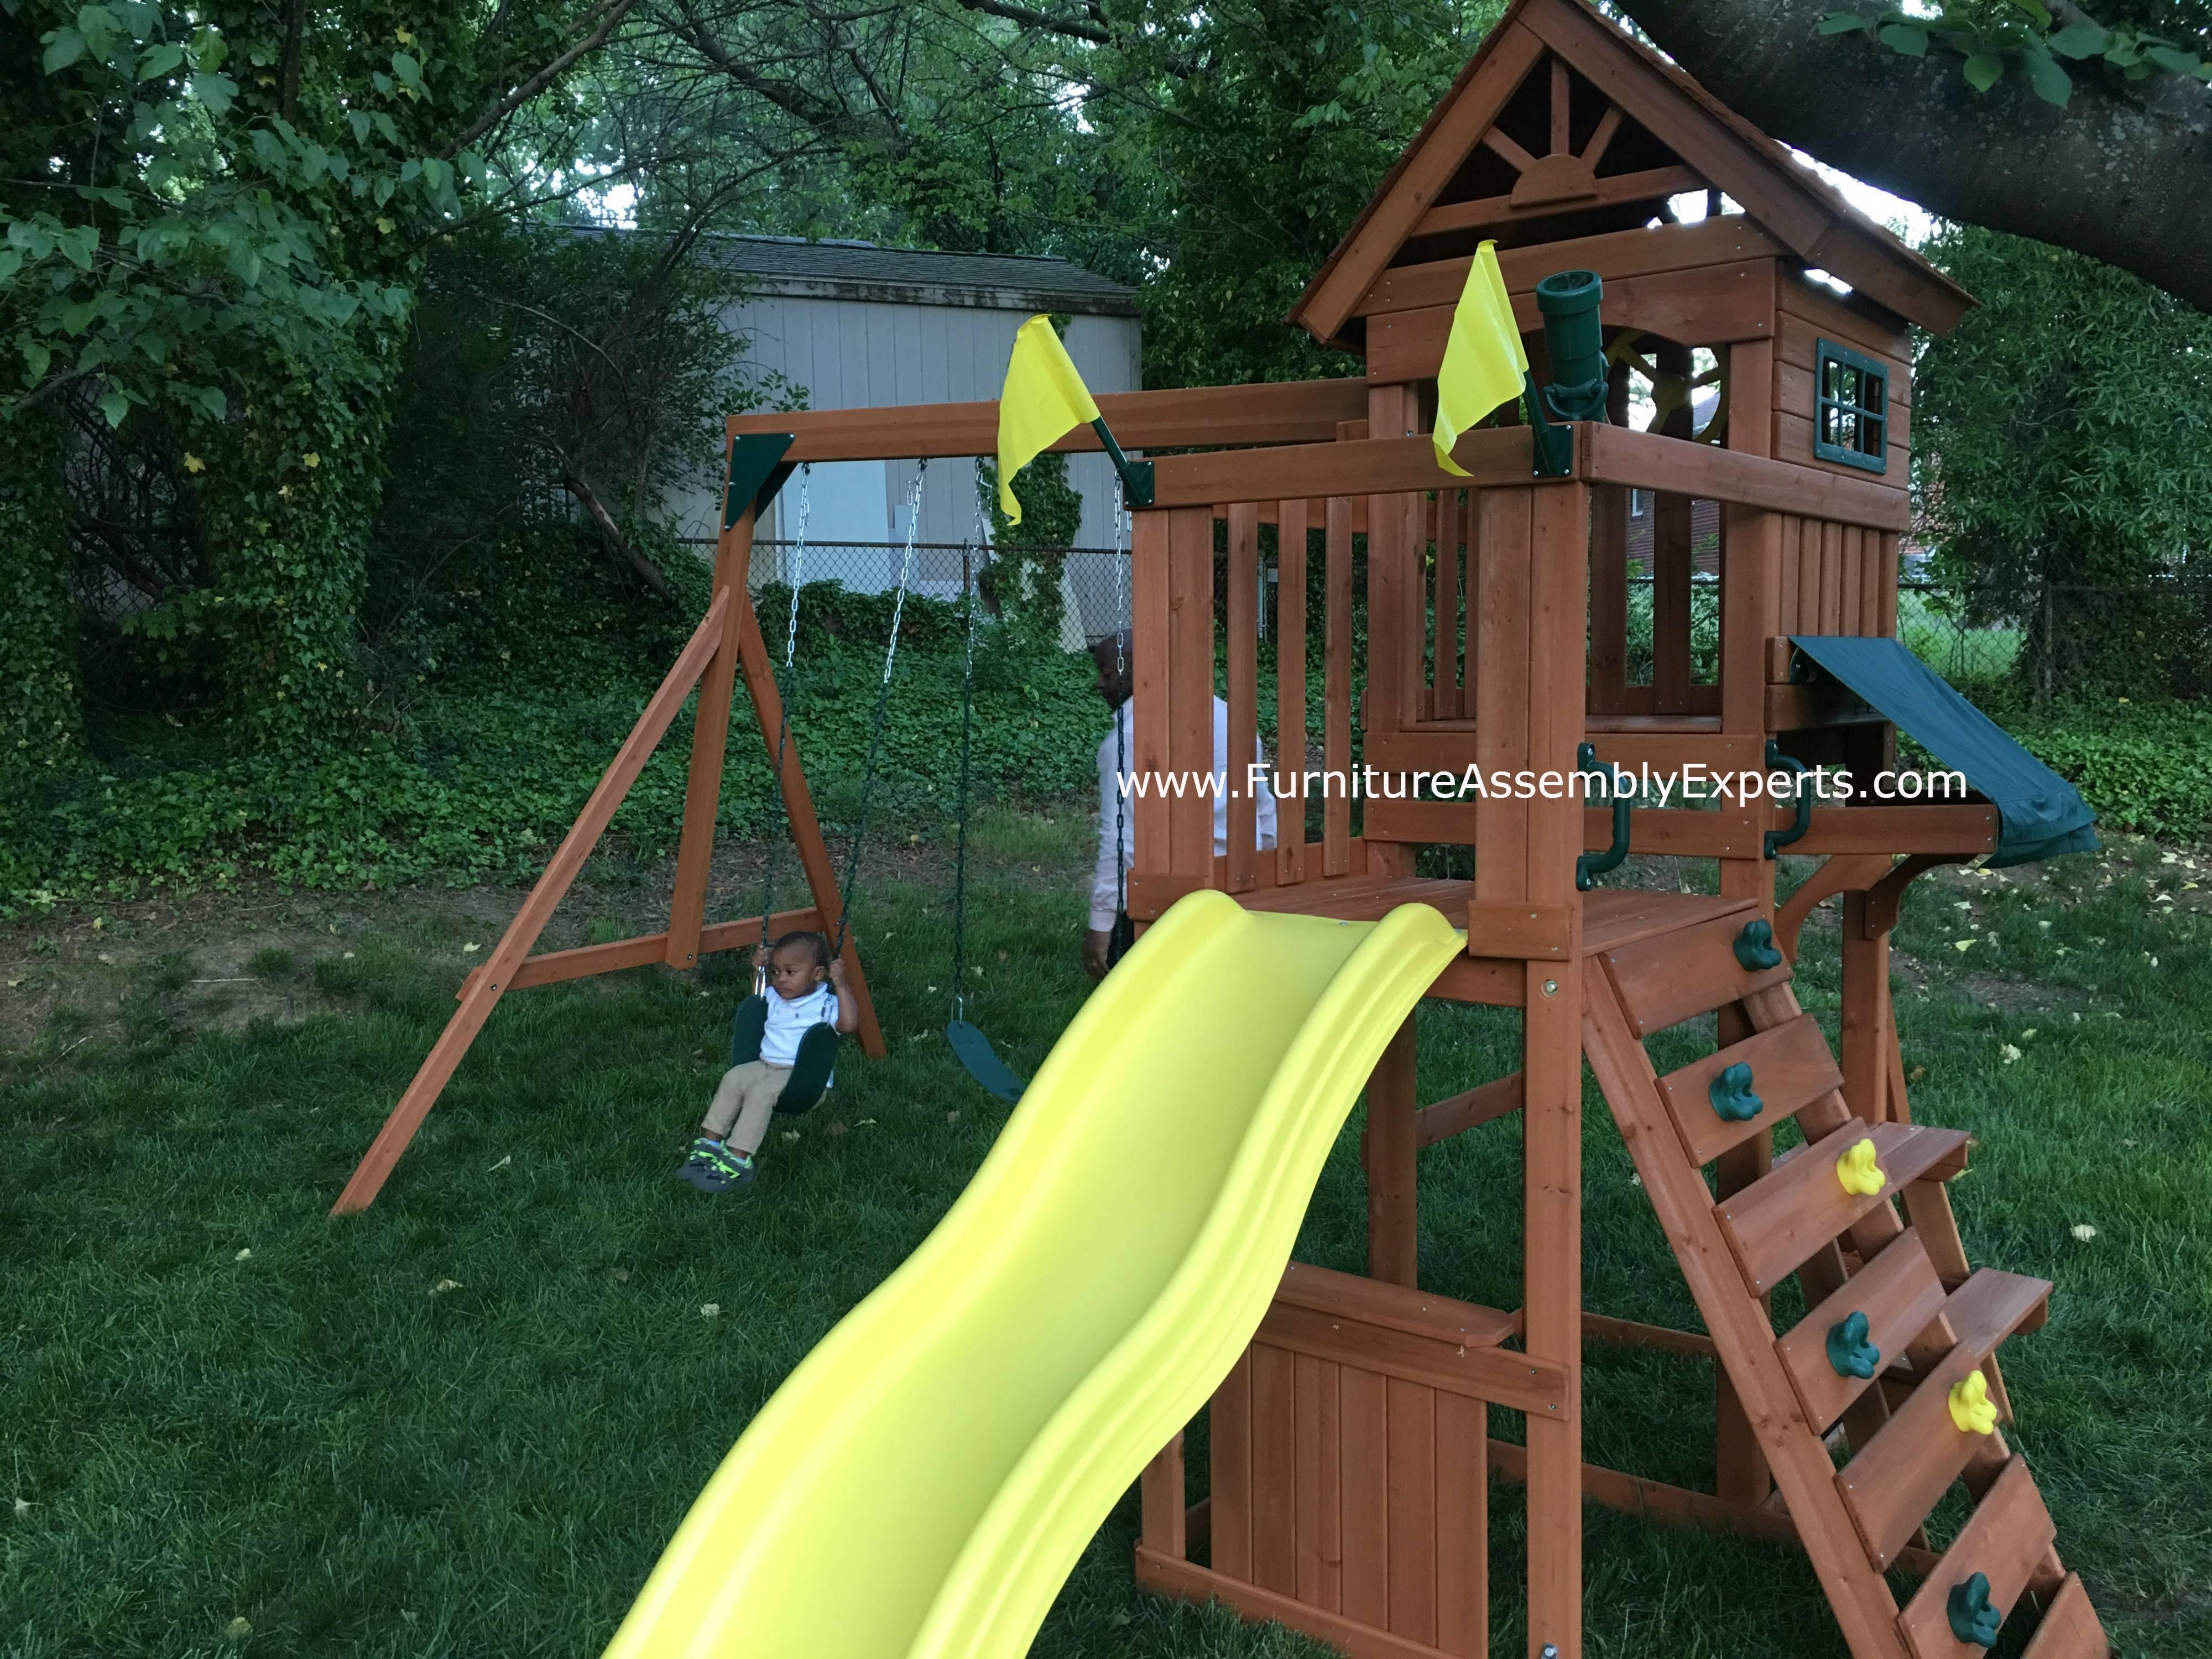 Swing n slide swing set installation in Maryland